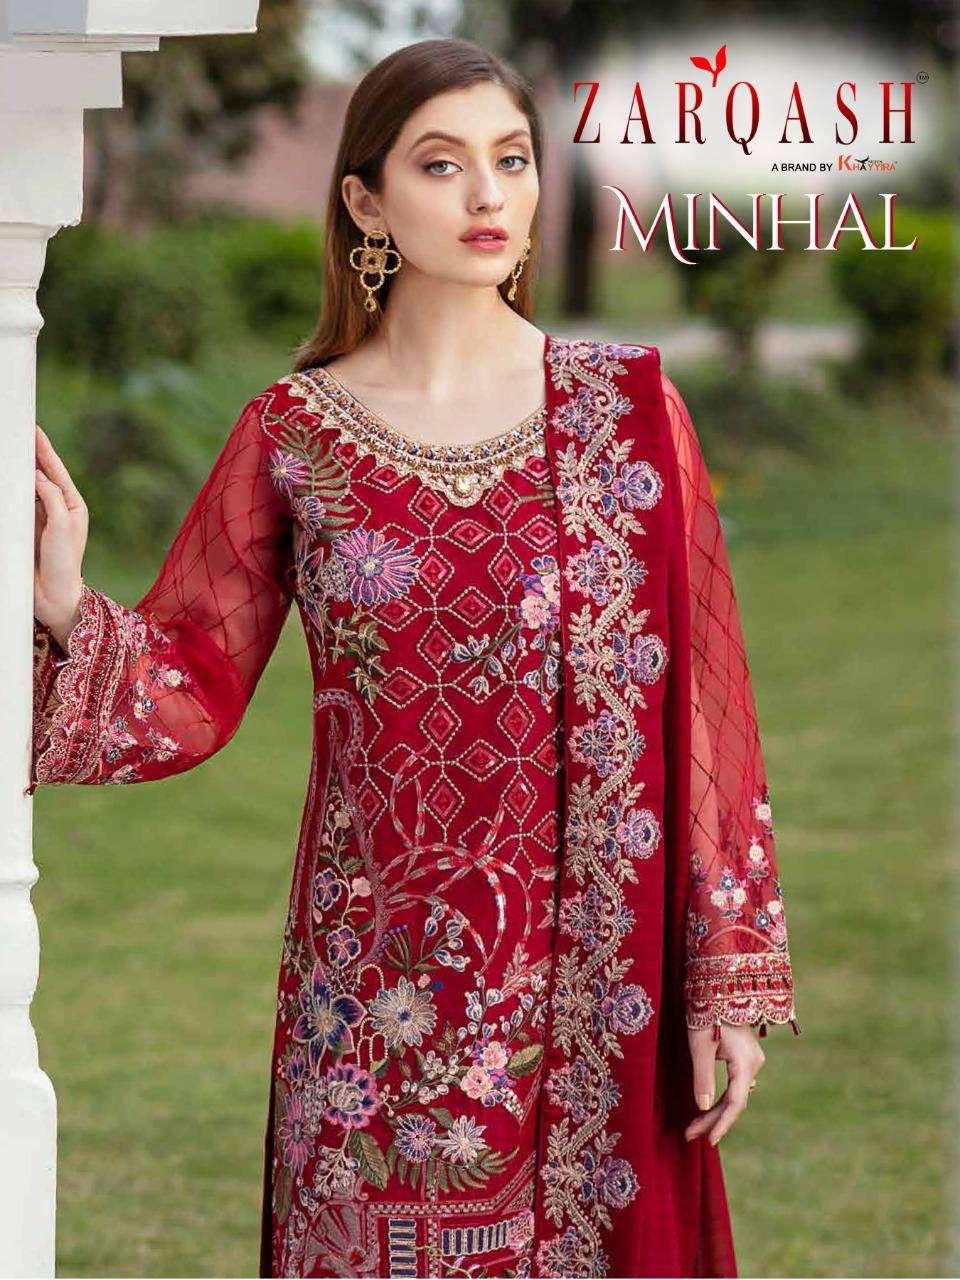 Zarqash Minhal Designer Pakistani Suit Catalog Wholesale Price